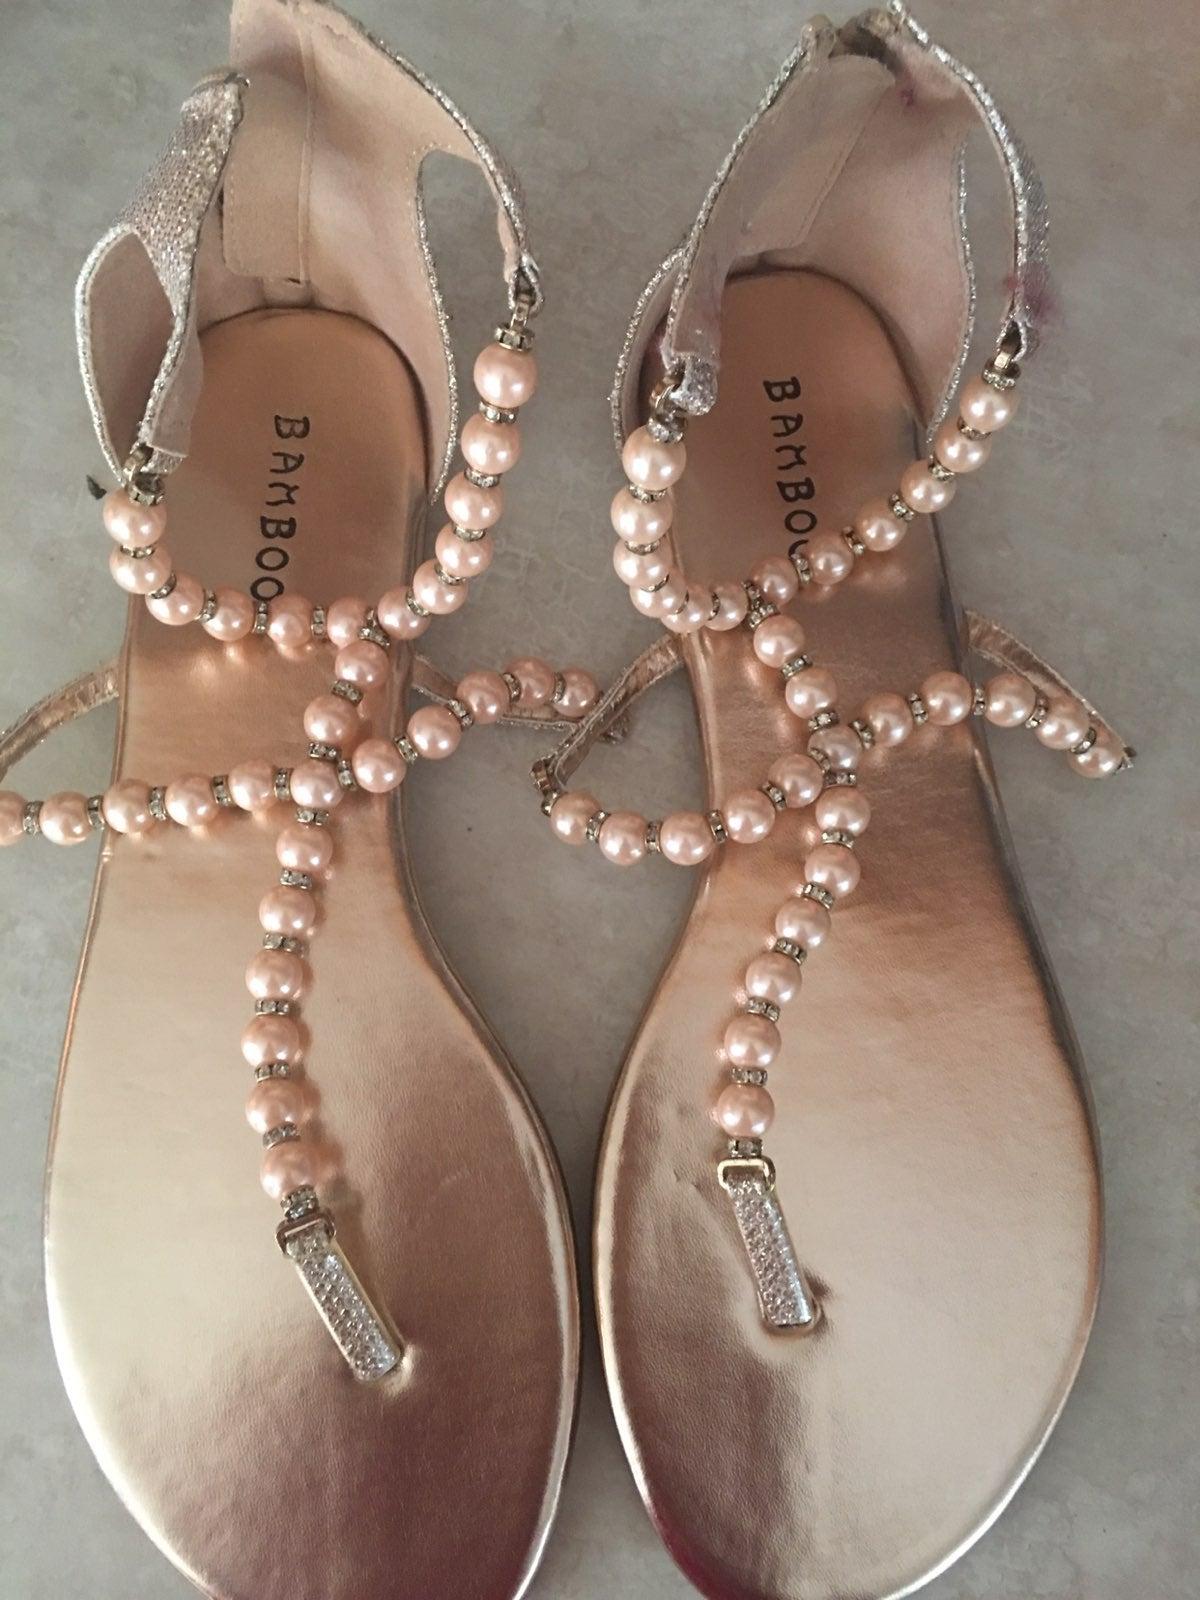 Beaded Gladiator Sandals 8.5